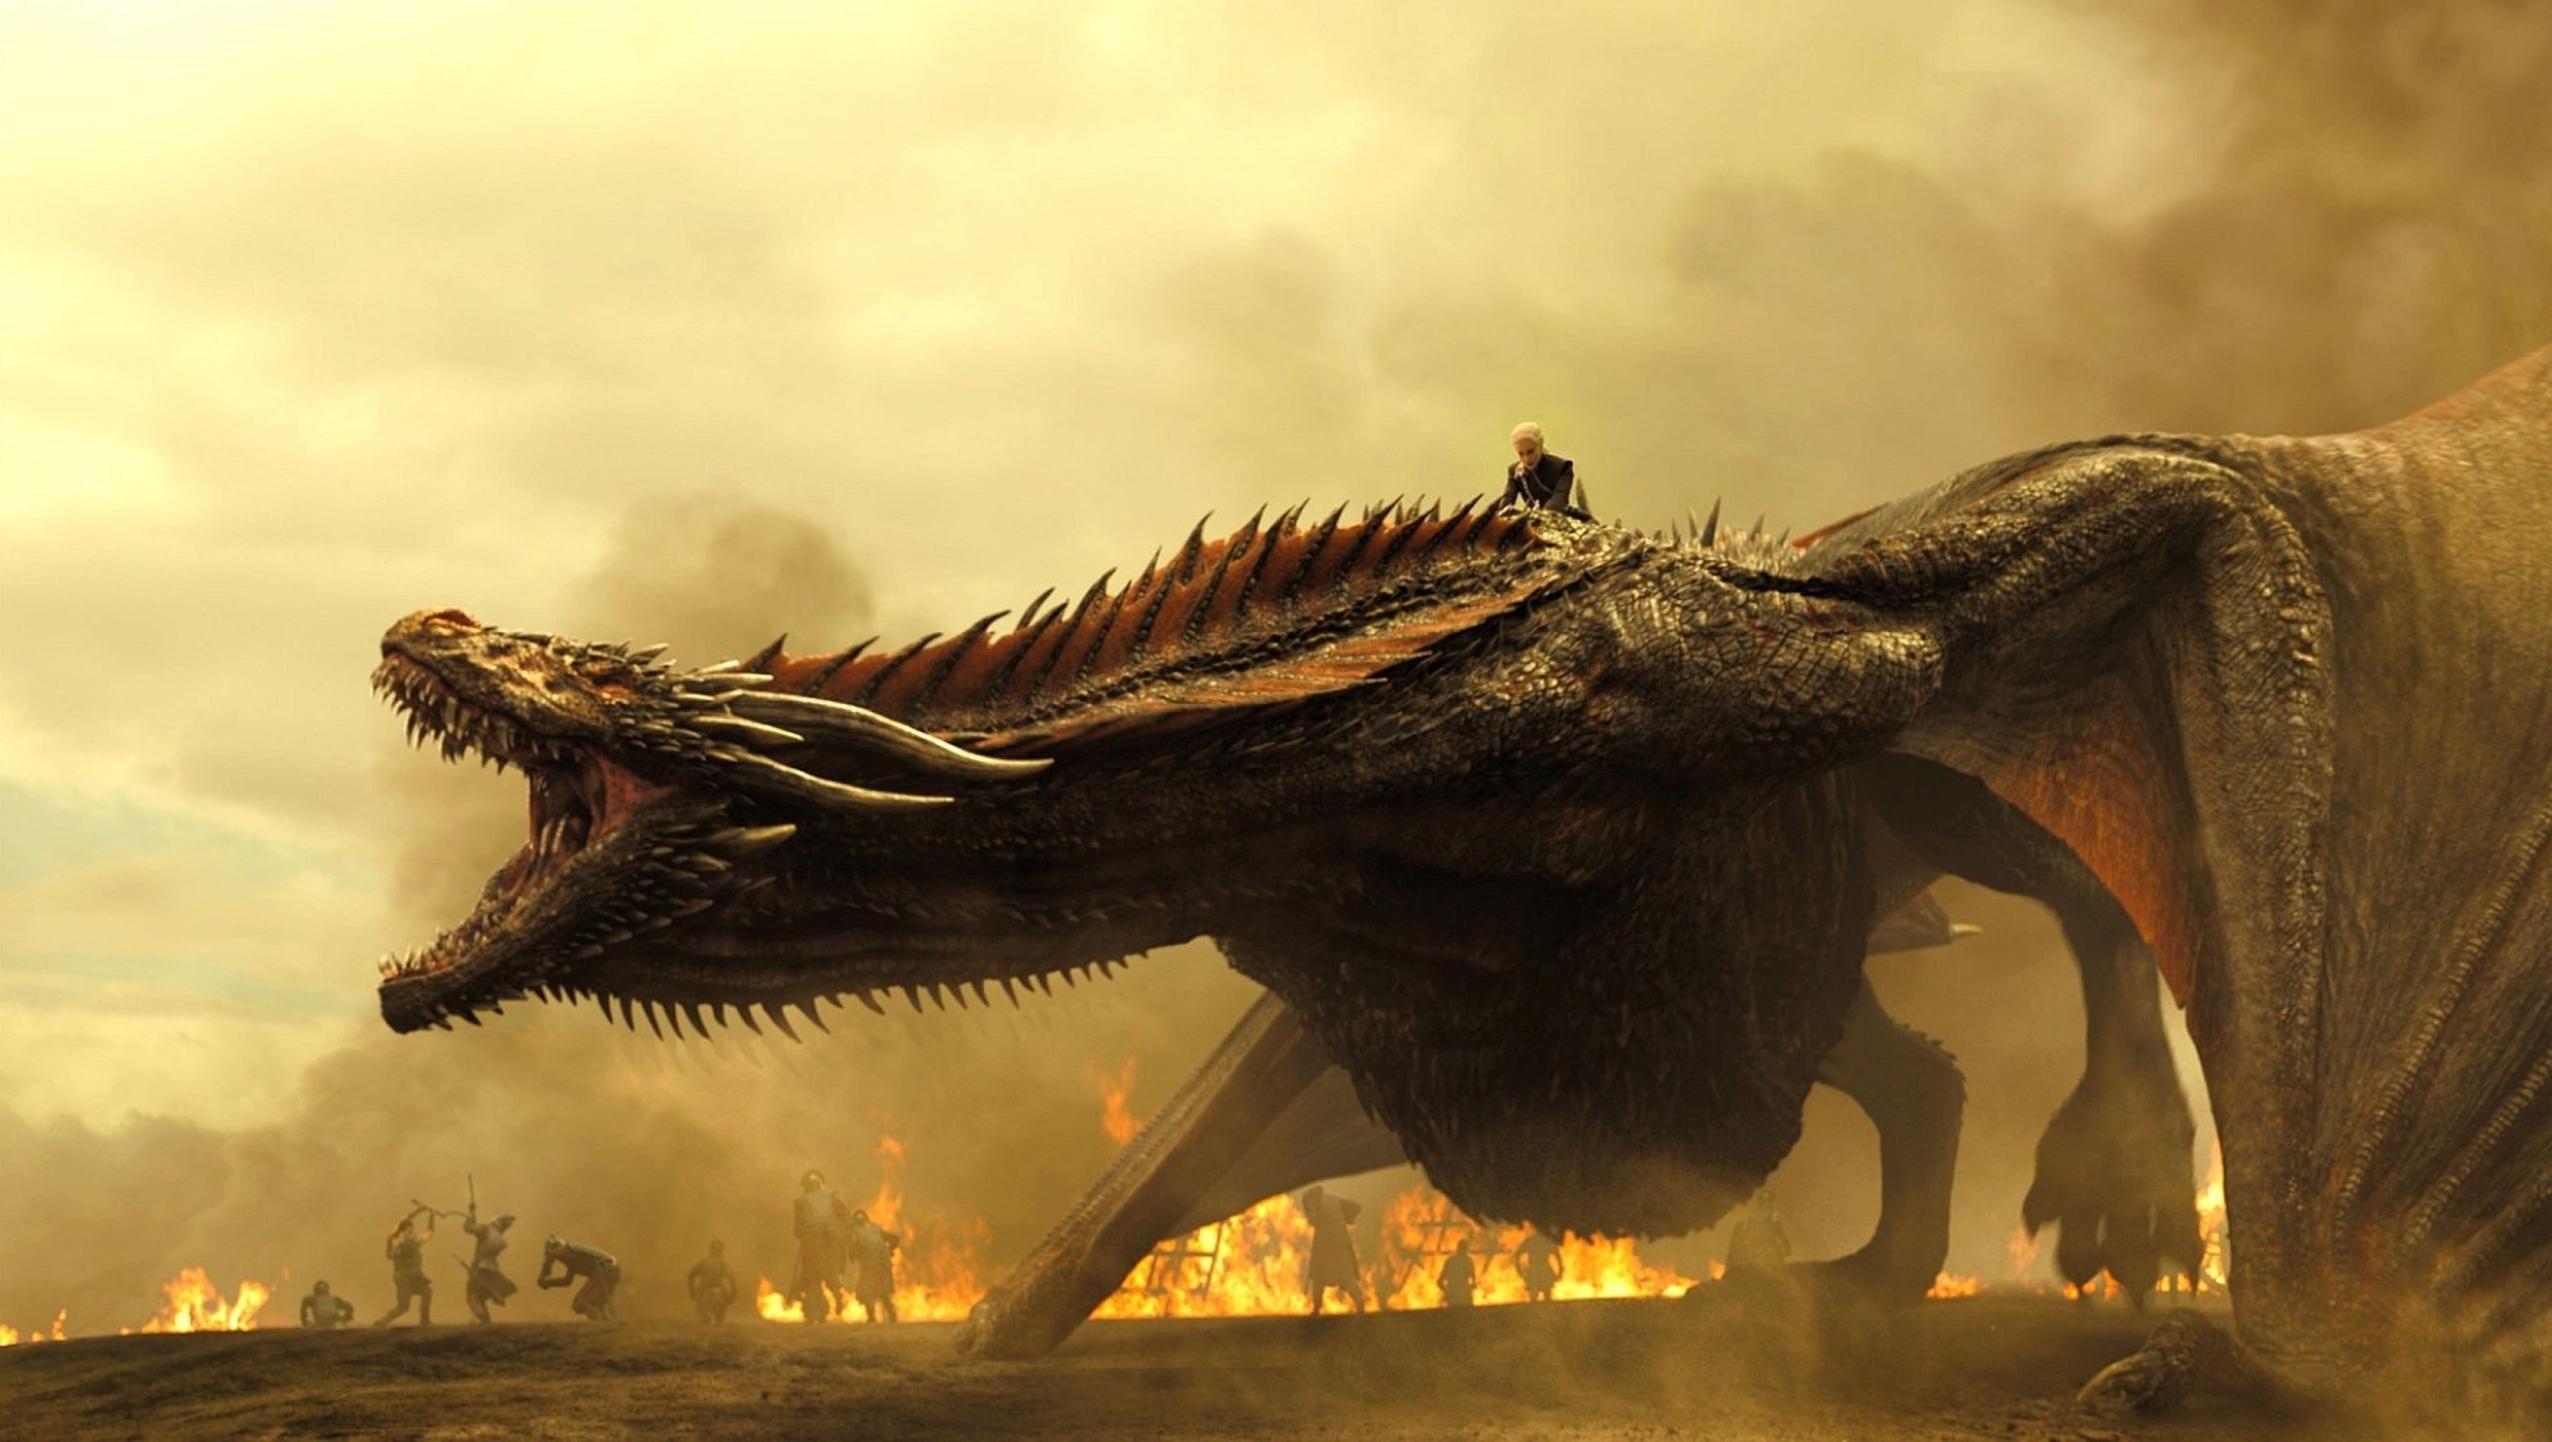 Game Of Thrones Desktop Wallpaper Moviemania Game Of Thrones Prequel Game Of Thrones Dragons Watch Game Of Thrones